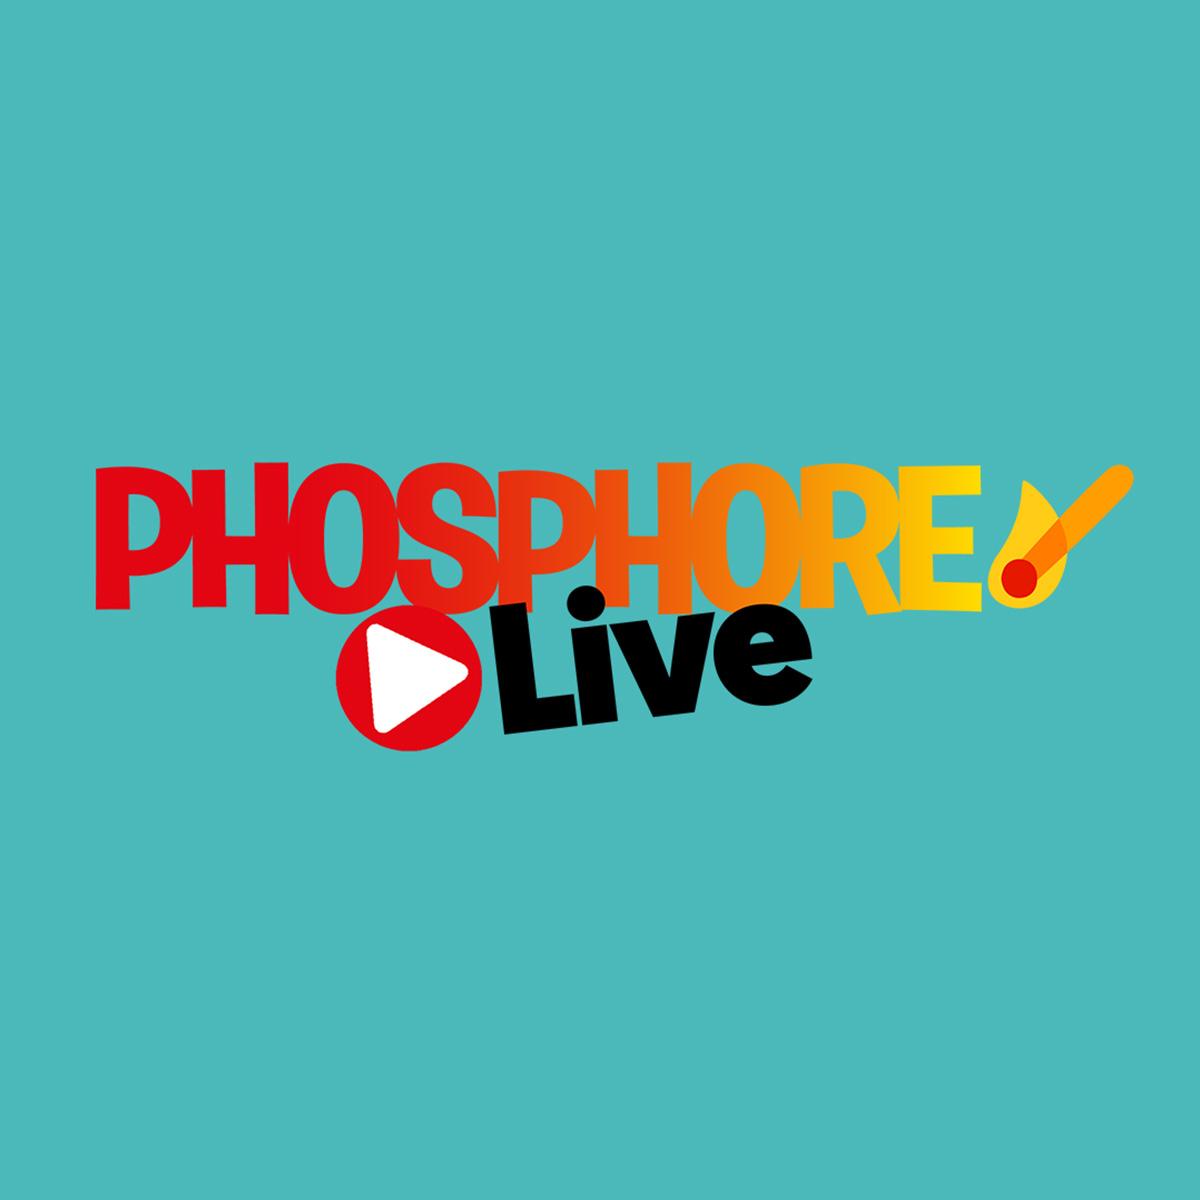 Phosphore - Lelive